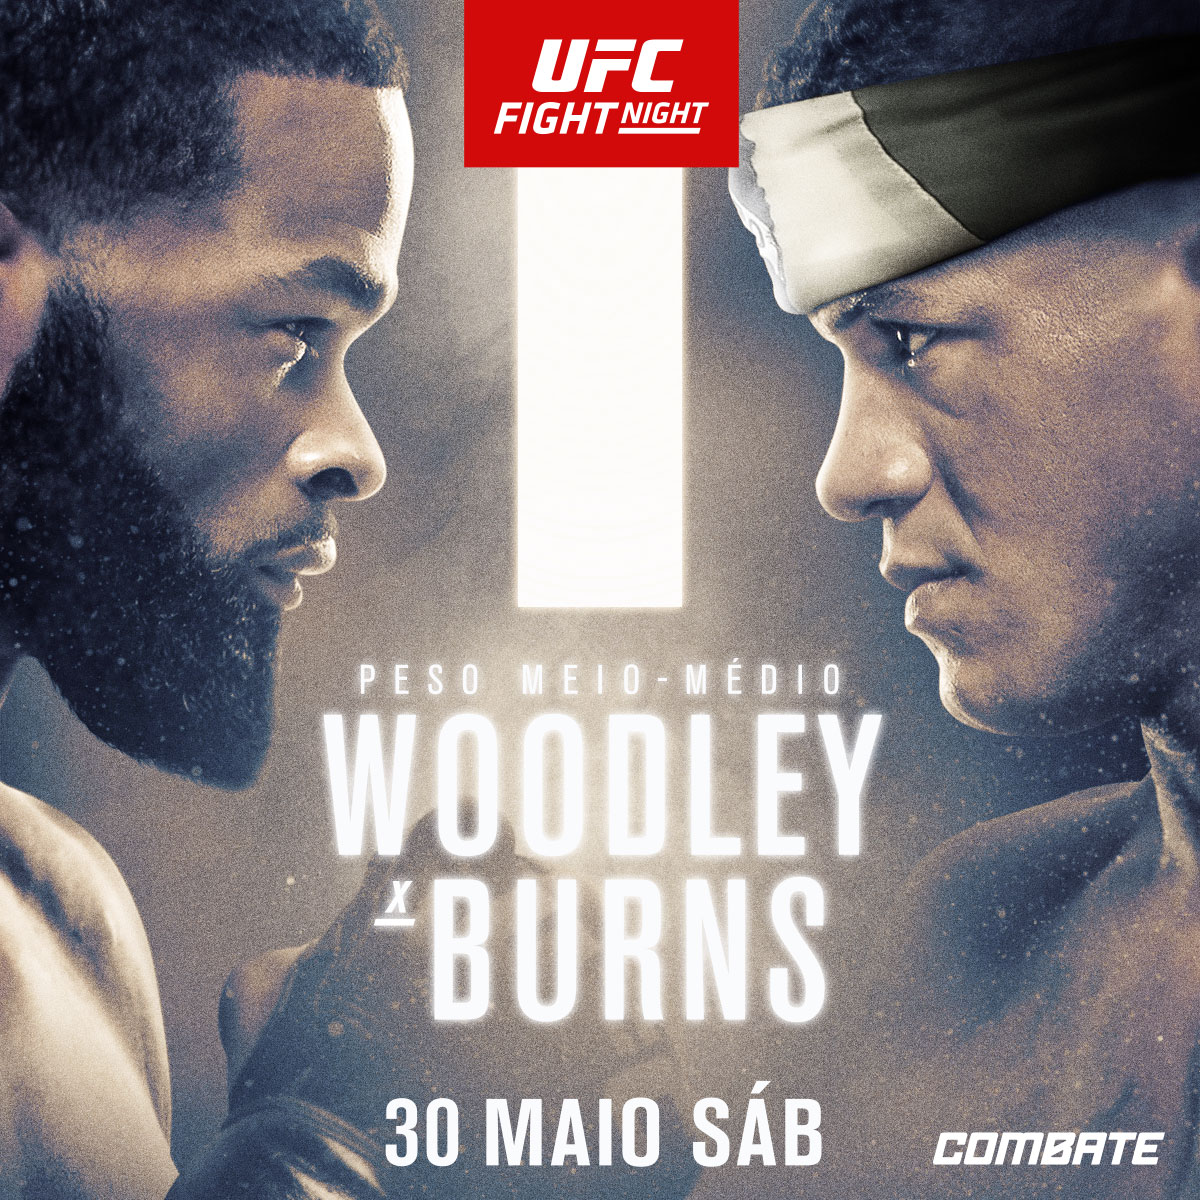 FIGHT WEEK!   O brasileiro @GilbertDurinho 🇧🇷 enfrenta o ex-campeão @TWooodley neste sábado (30) https://t.co/0Hienh8URK